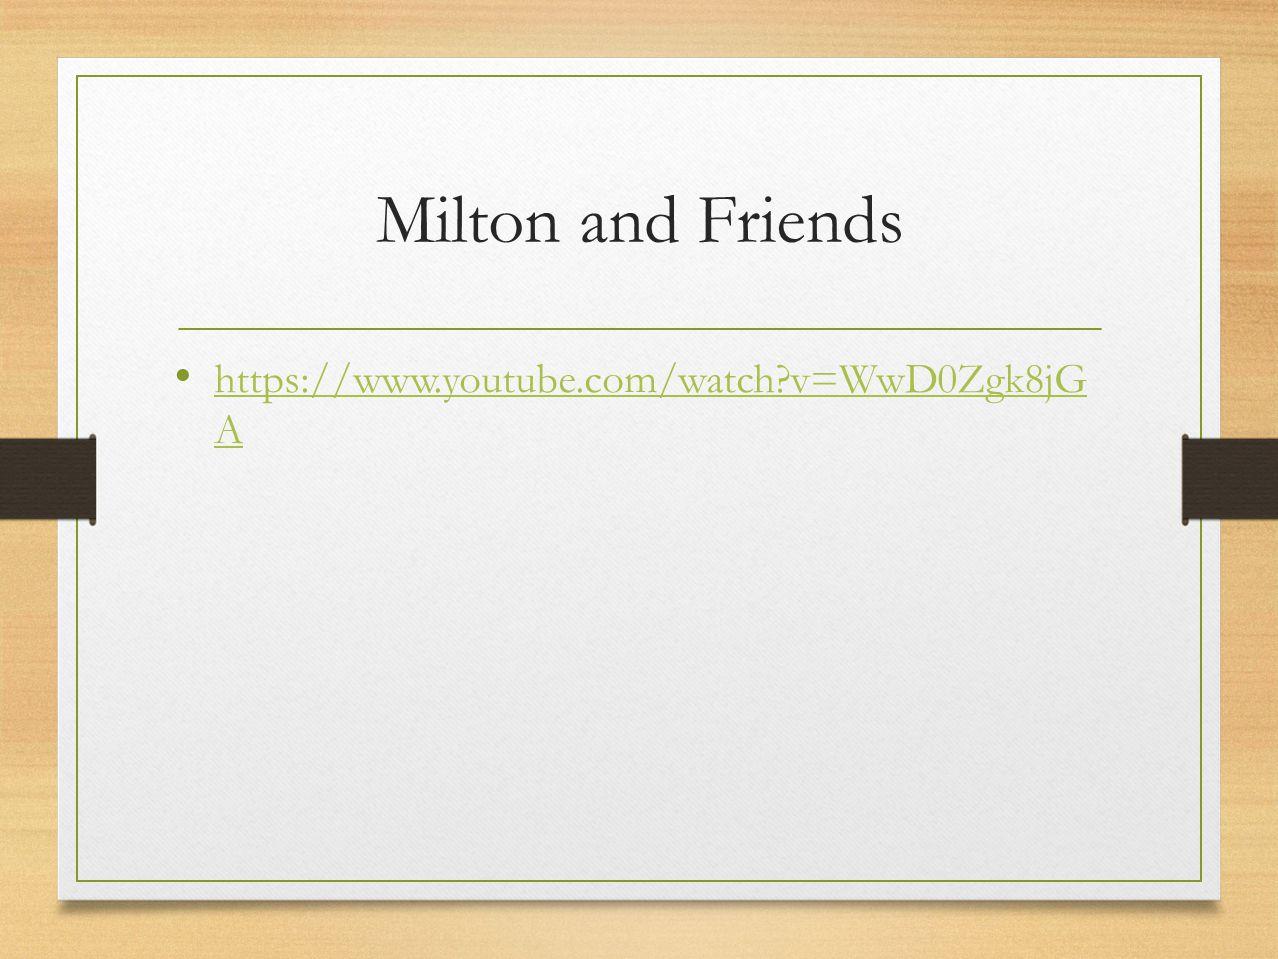 Milton and Friends https://www.youtube.com/watch v=WwD0Zgk8jG A https://www.youtube.com/watch v=WwD0Zgk8jG A